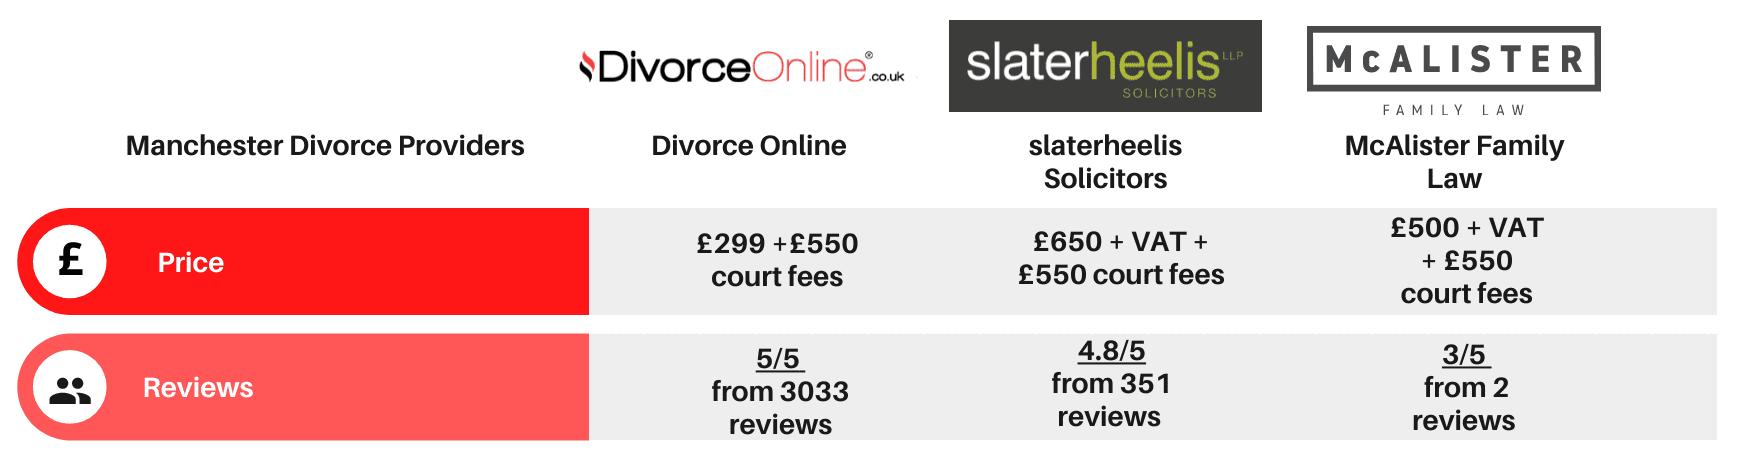 Manchester divorce solicitors comparison table